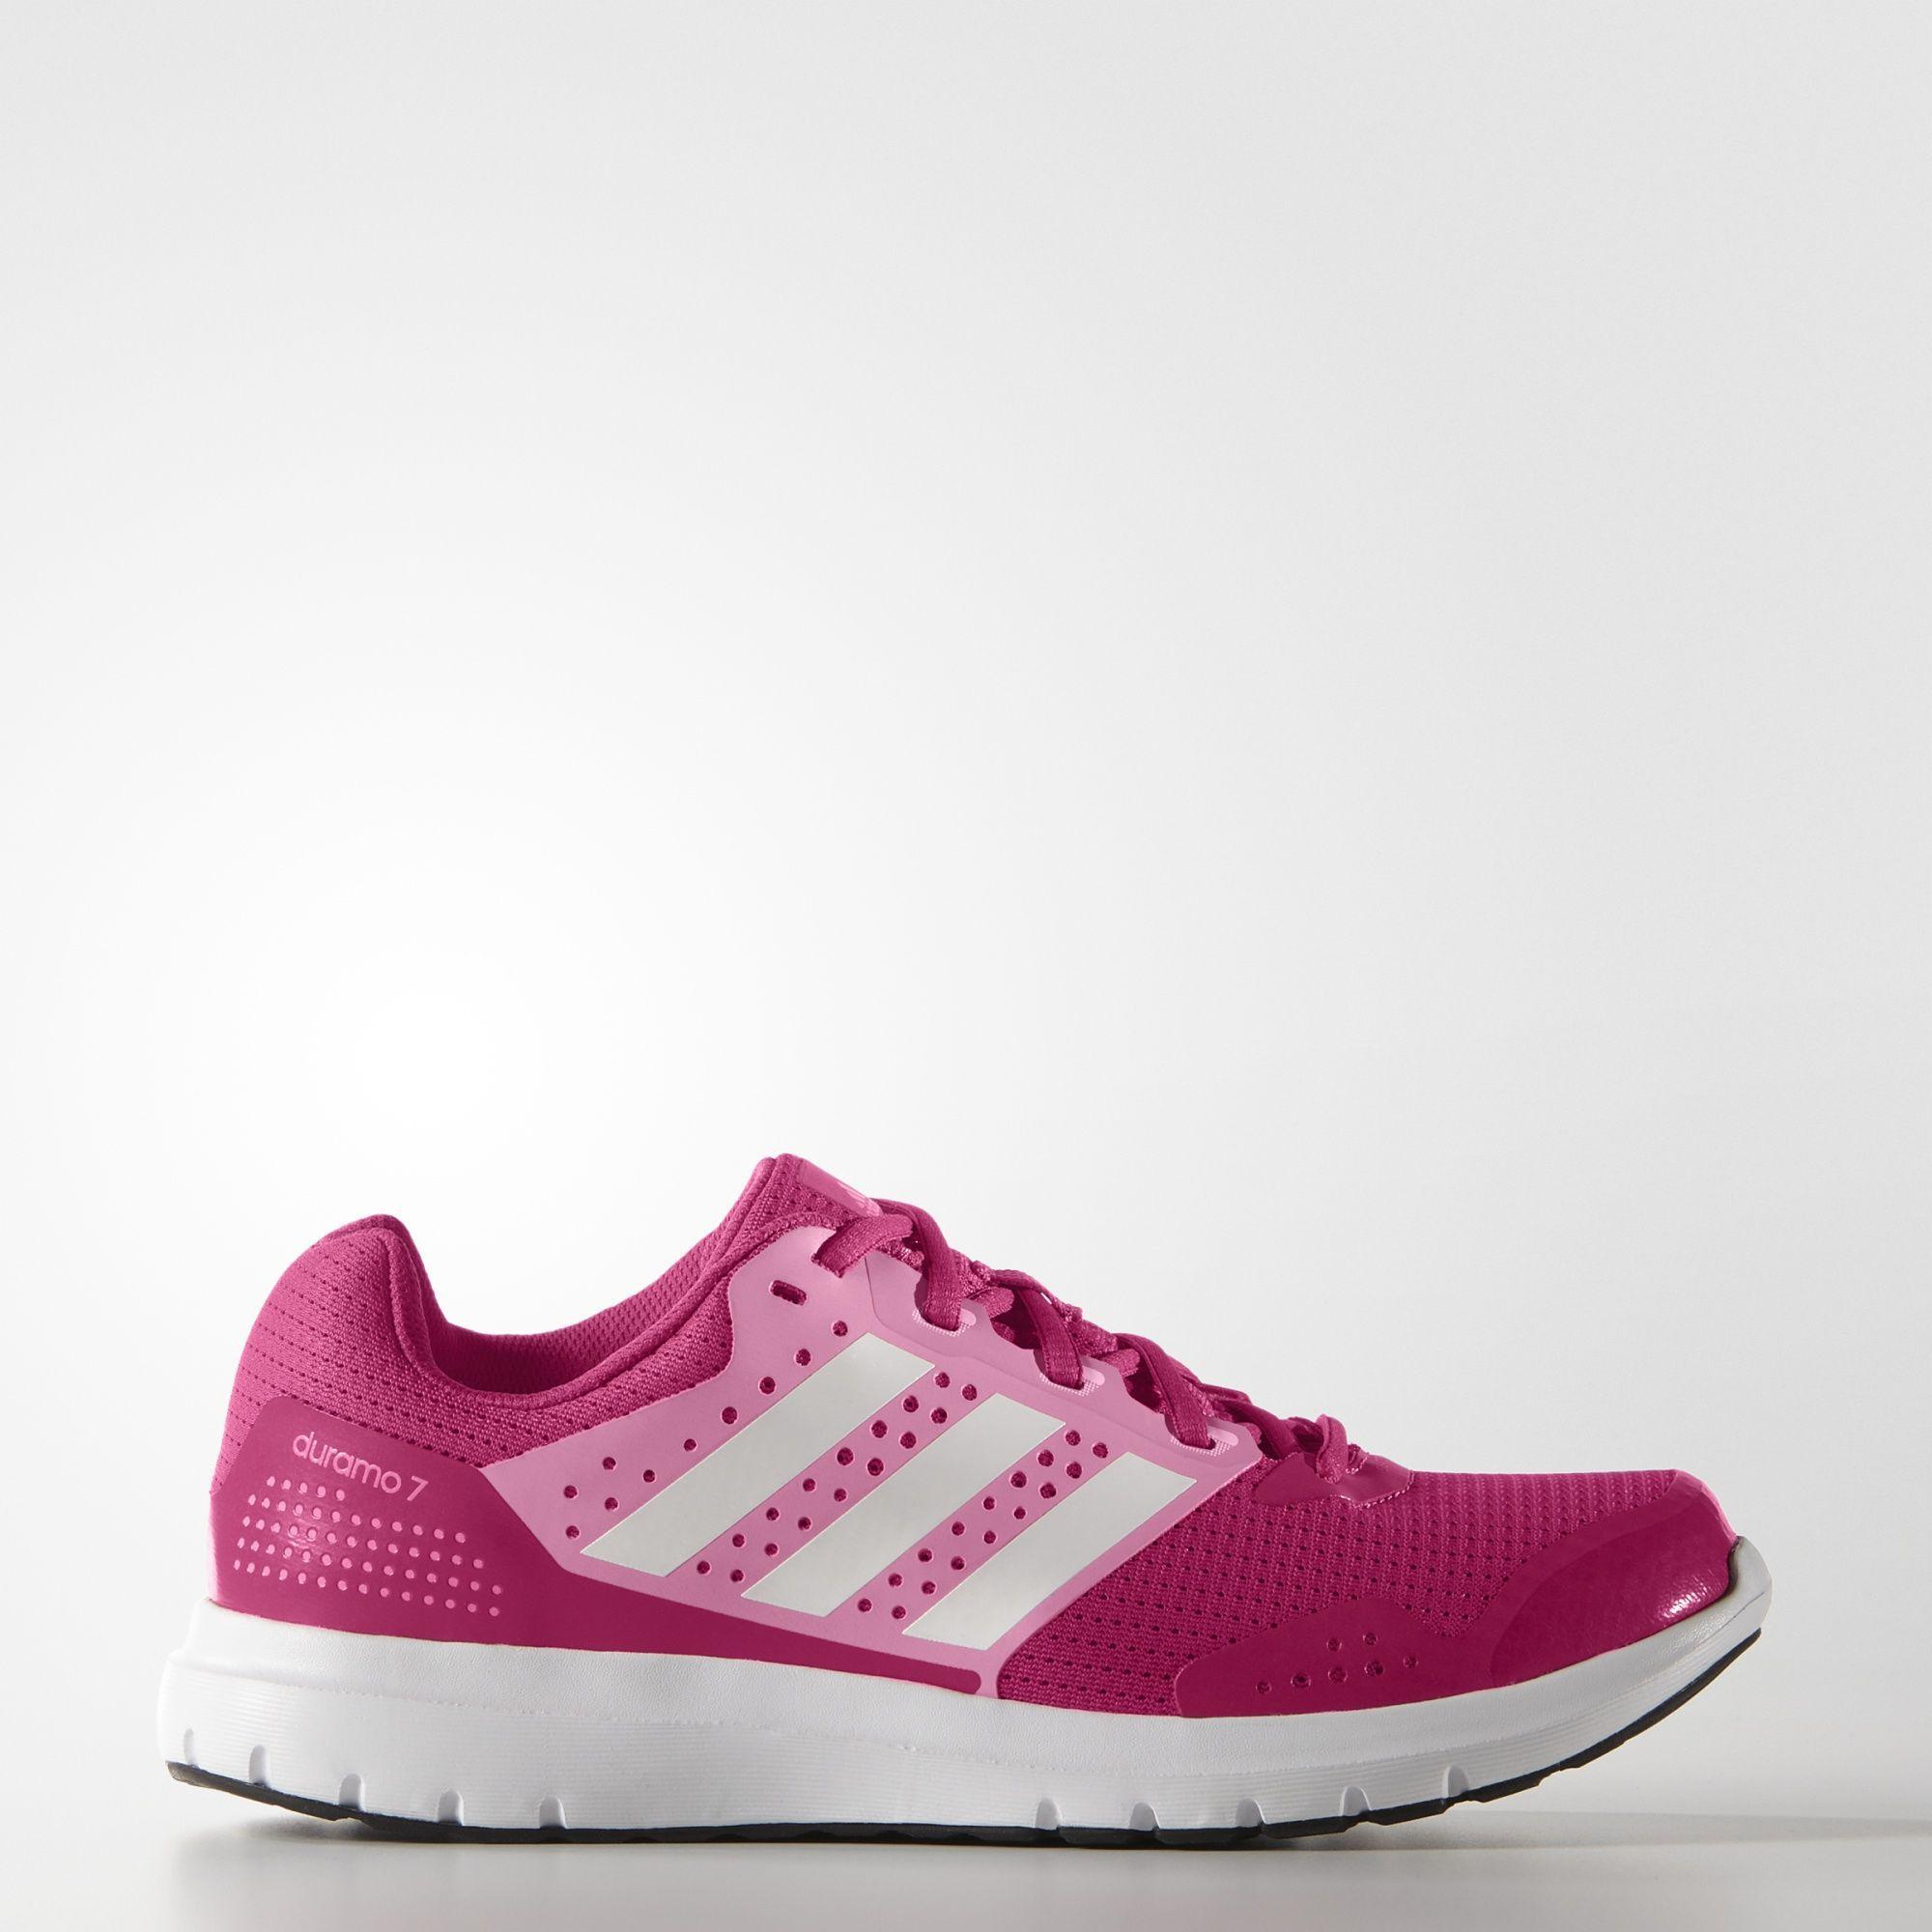 Damen Duramo 7 Schuh